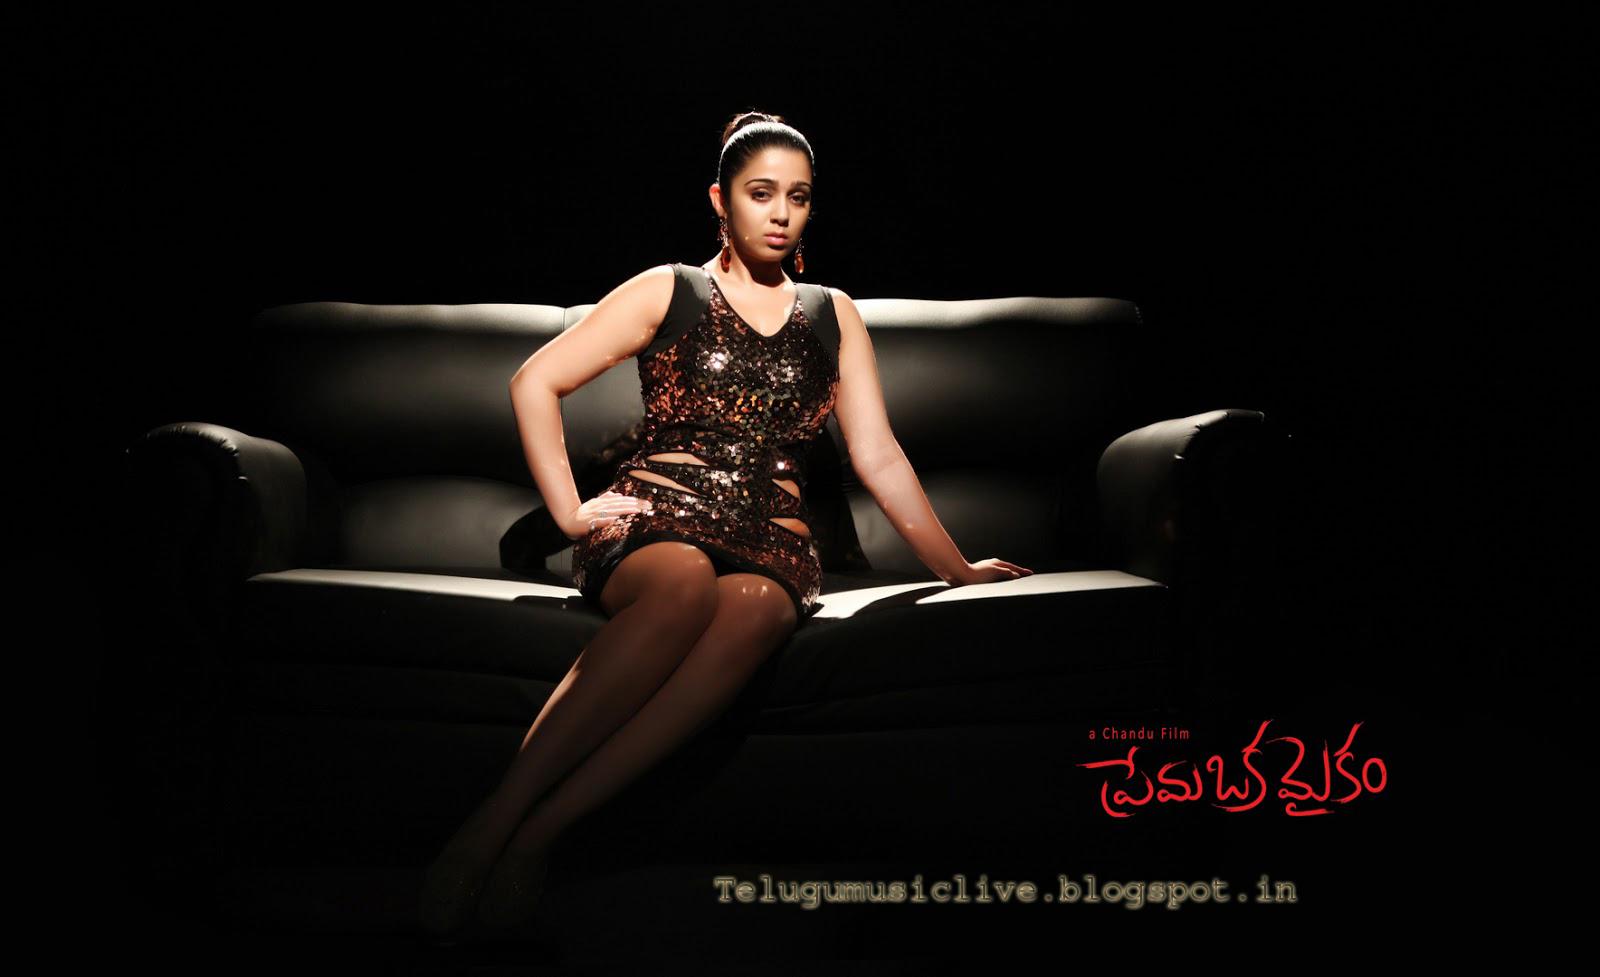 http://3.bp.blogspot.com/-p9POZ6sfuAA/UUFskoH659I/AAAAAAAAE5w/A-6xxp-tRCM/s1600/Prema+Oka+Maikam+Movie+Latest+Posters+(9)+copy.jpg